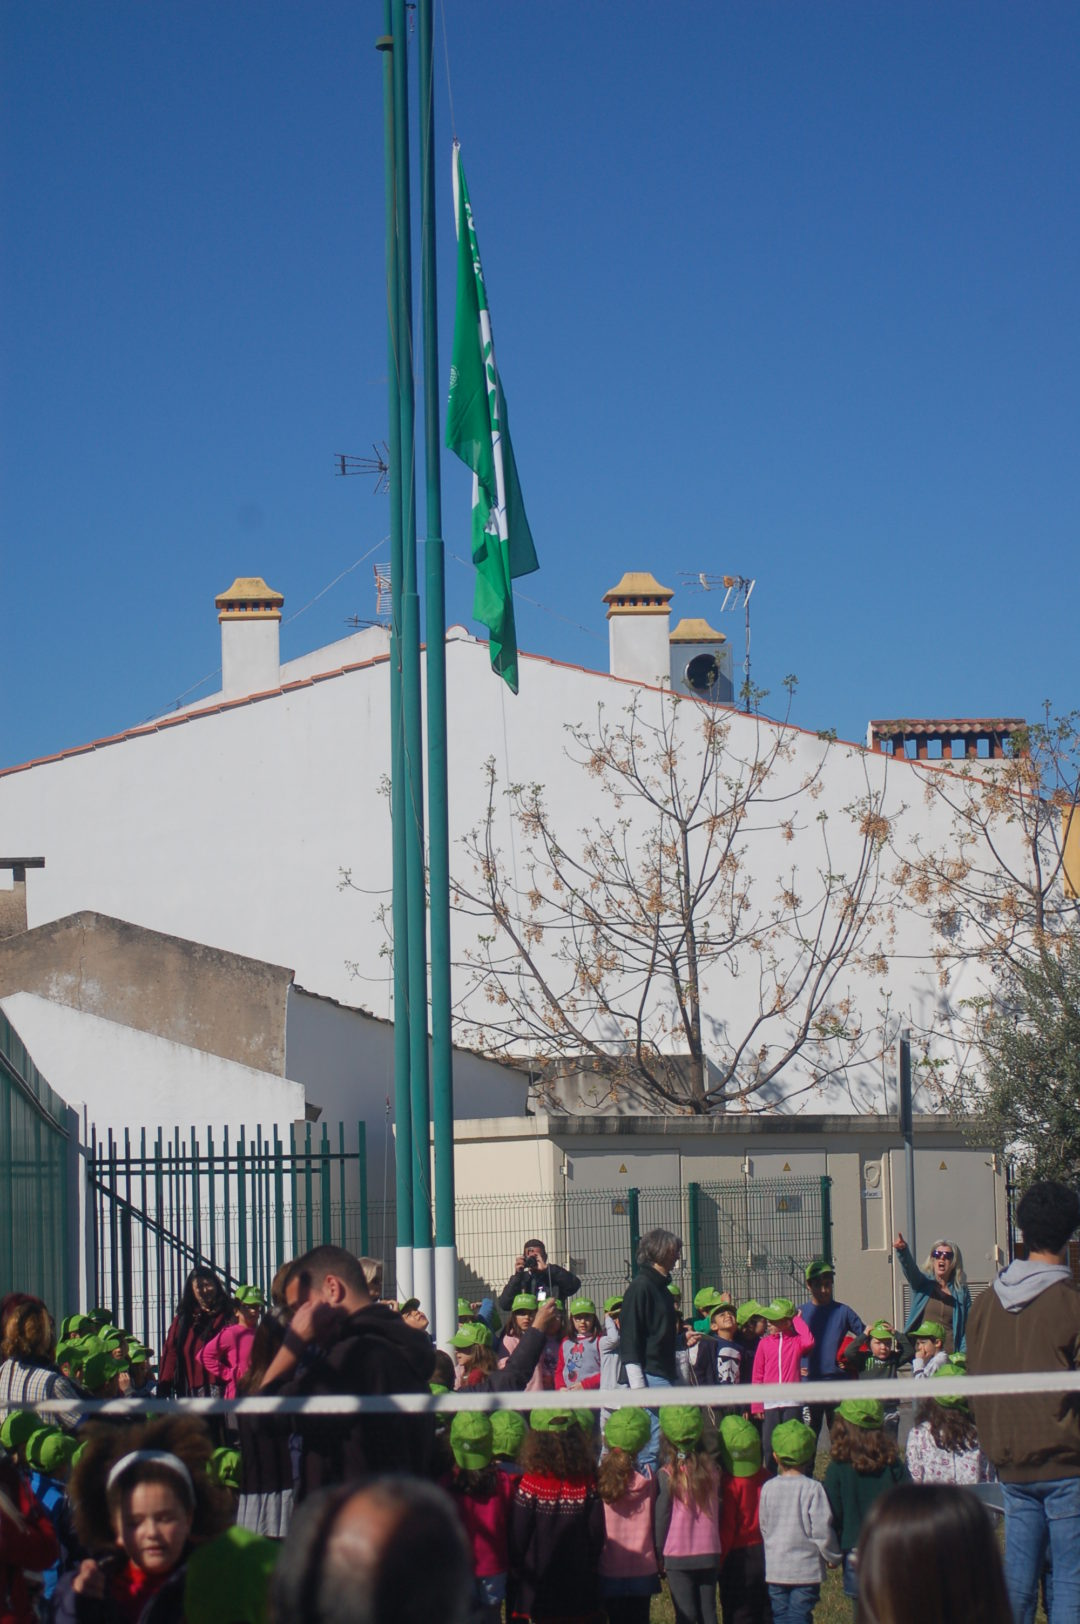 Hastear da Bandeira Verde